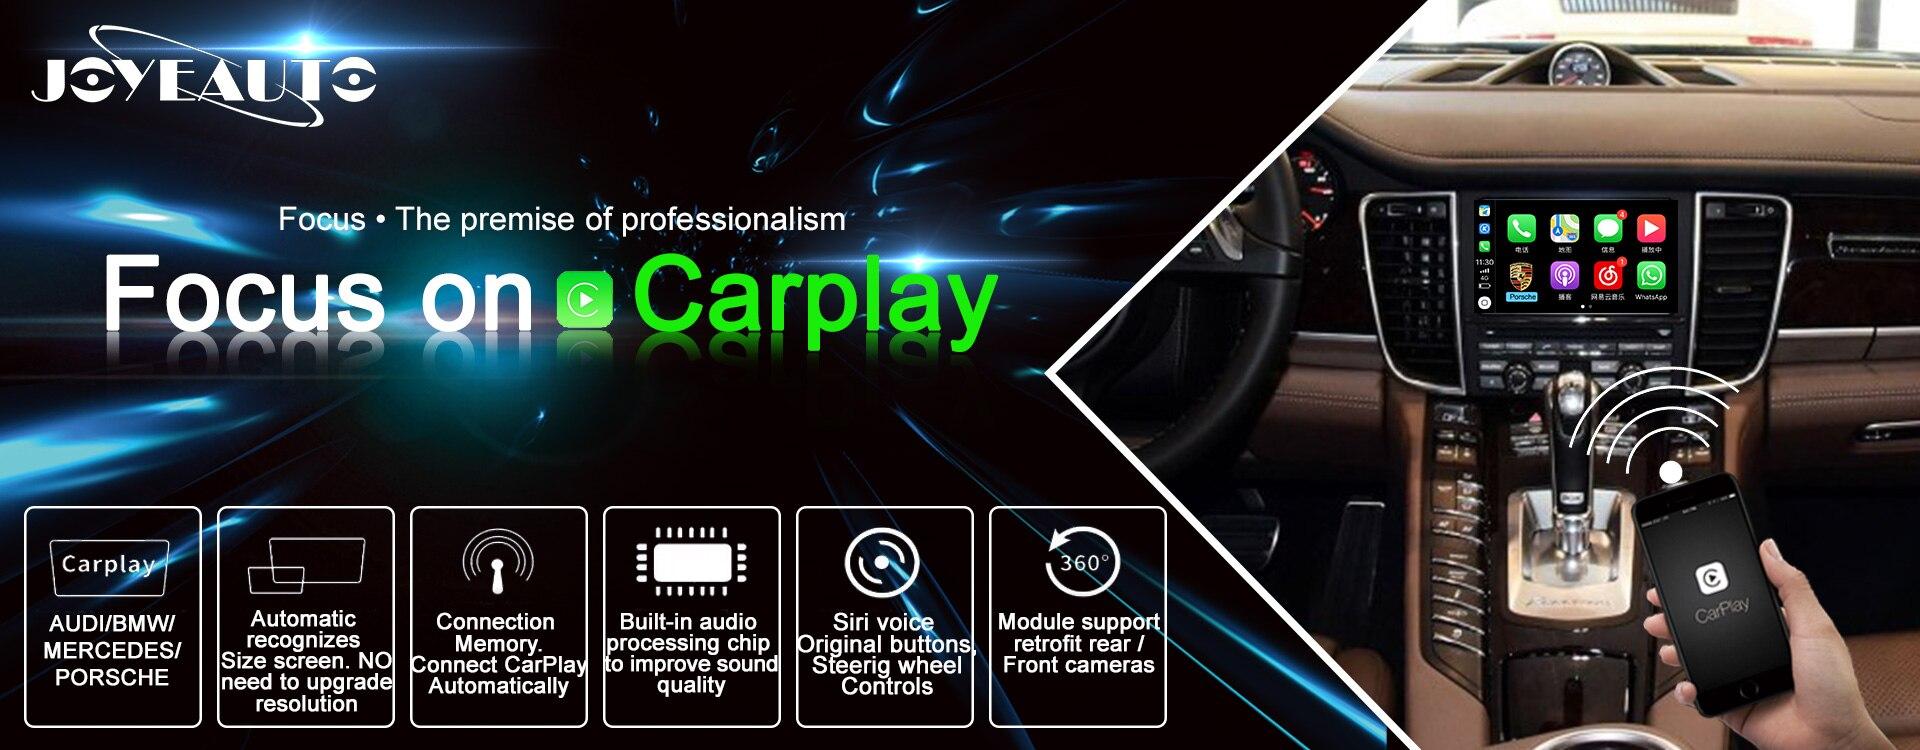 Joyeauto Wifi Wireless Carplay Android Auto Mirror Retrofit for 2010-2016  Porsche Cayenne PCM 3 1 PCM 4 0 support Reverse Camera